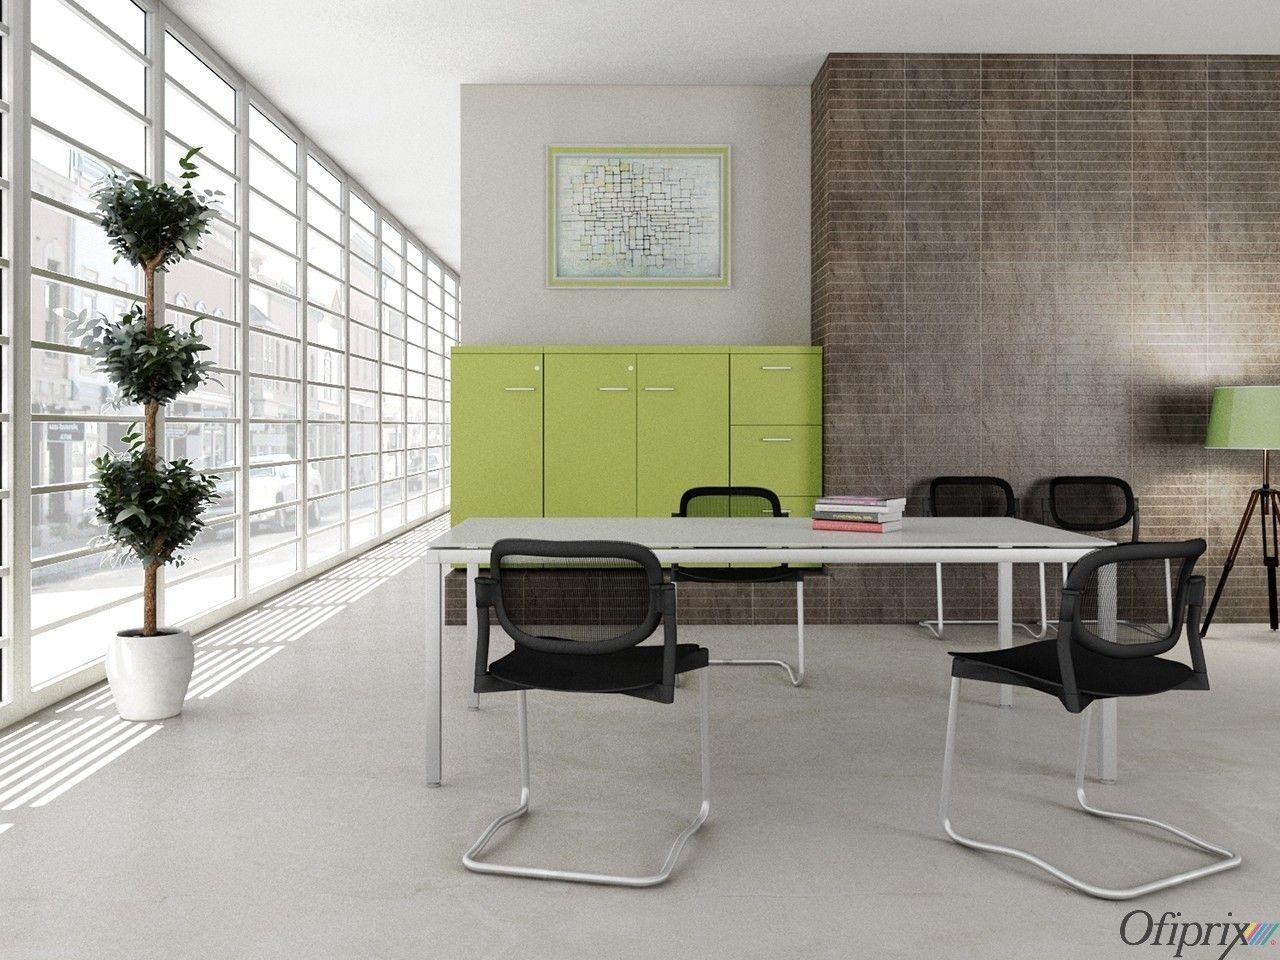 Mesas de despacho modernas serie link class mesas de for Mesas de despacho modernas